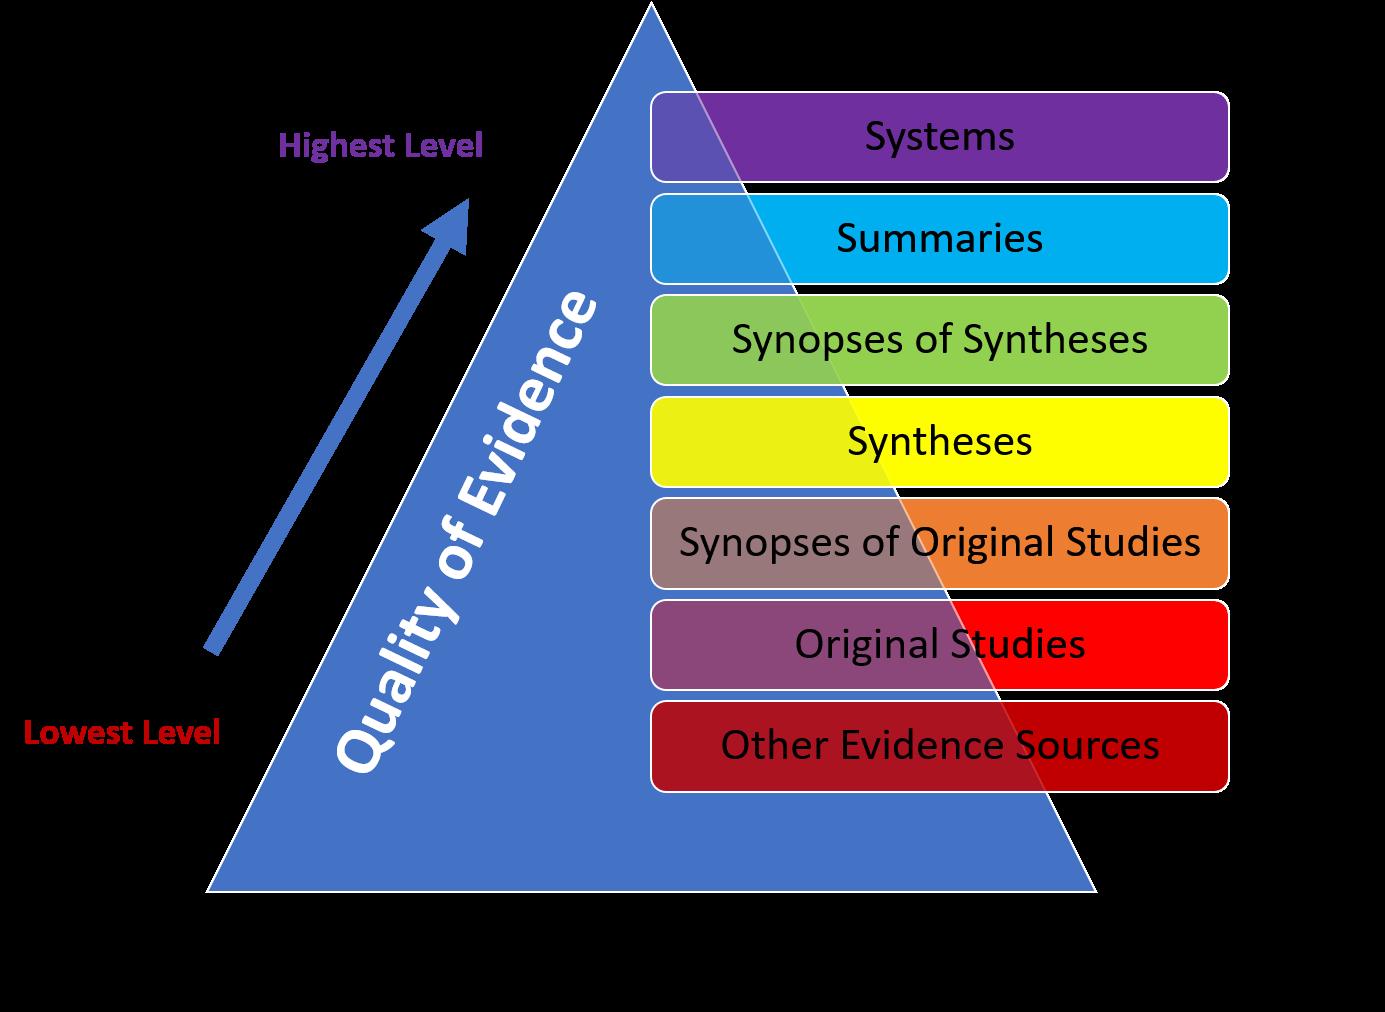 6spyramid